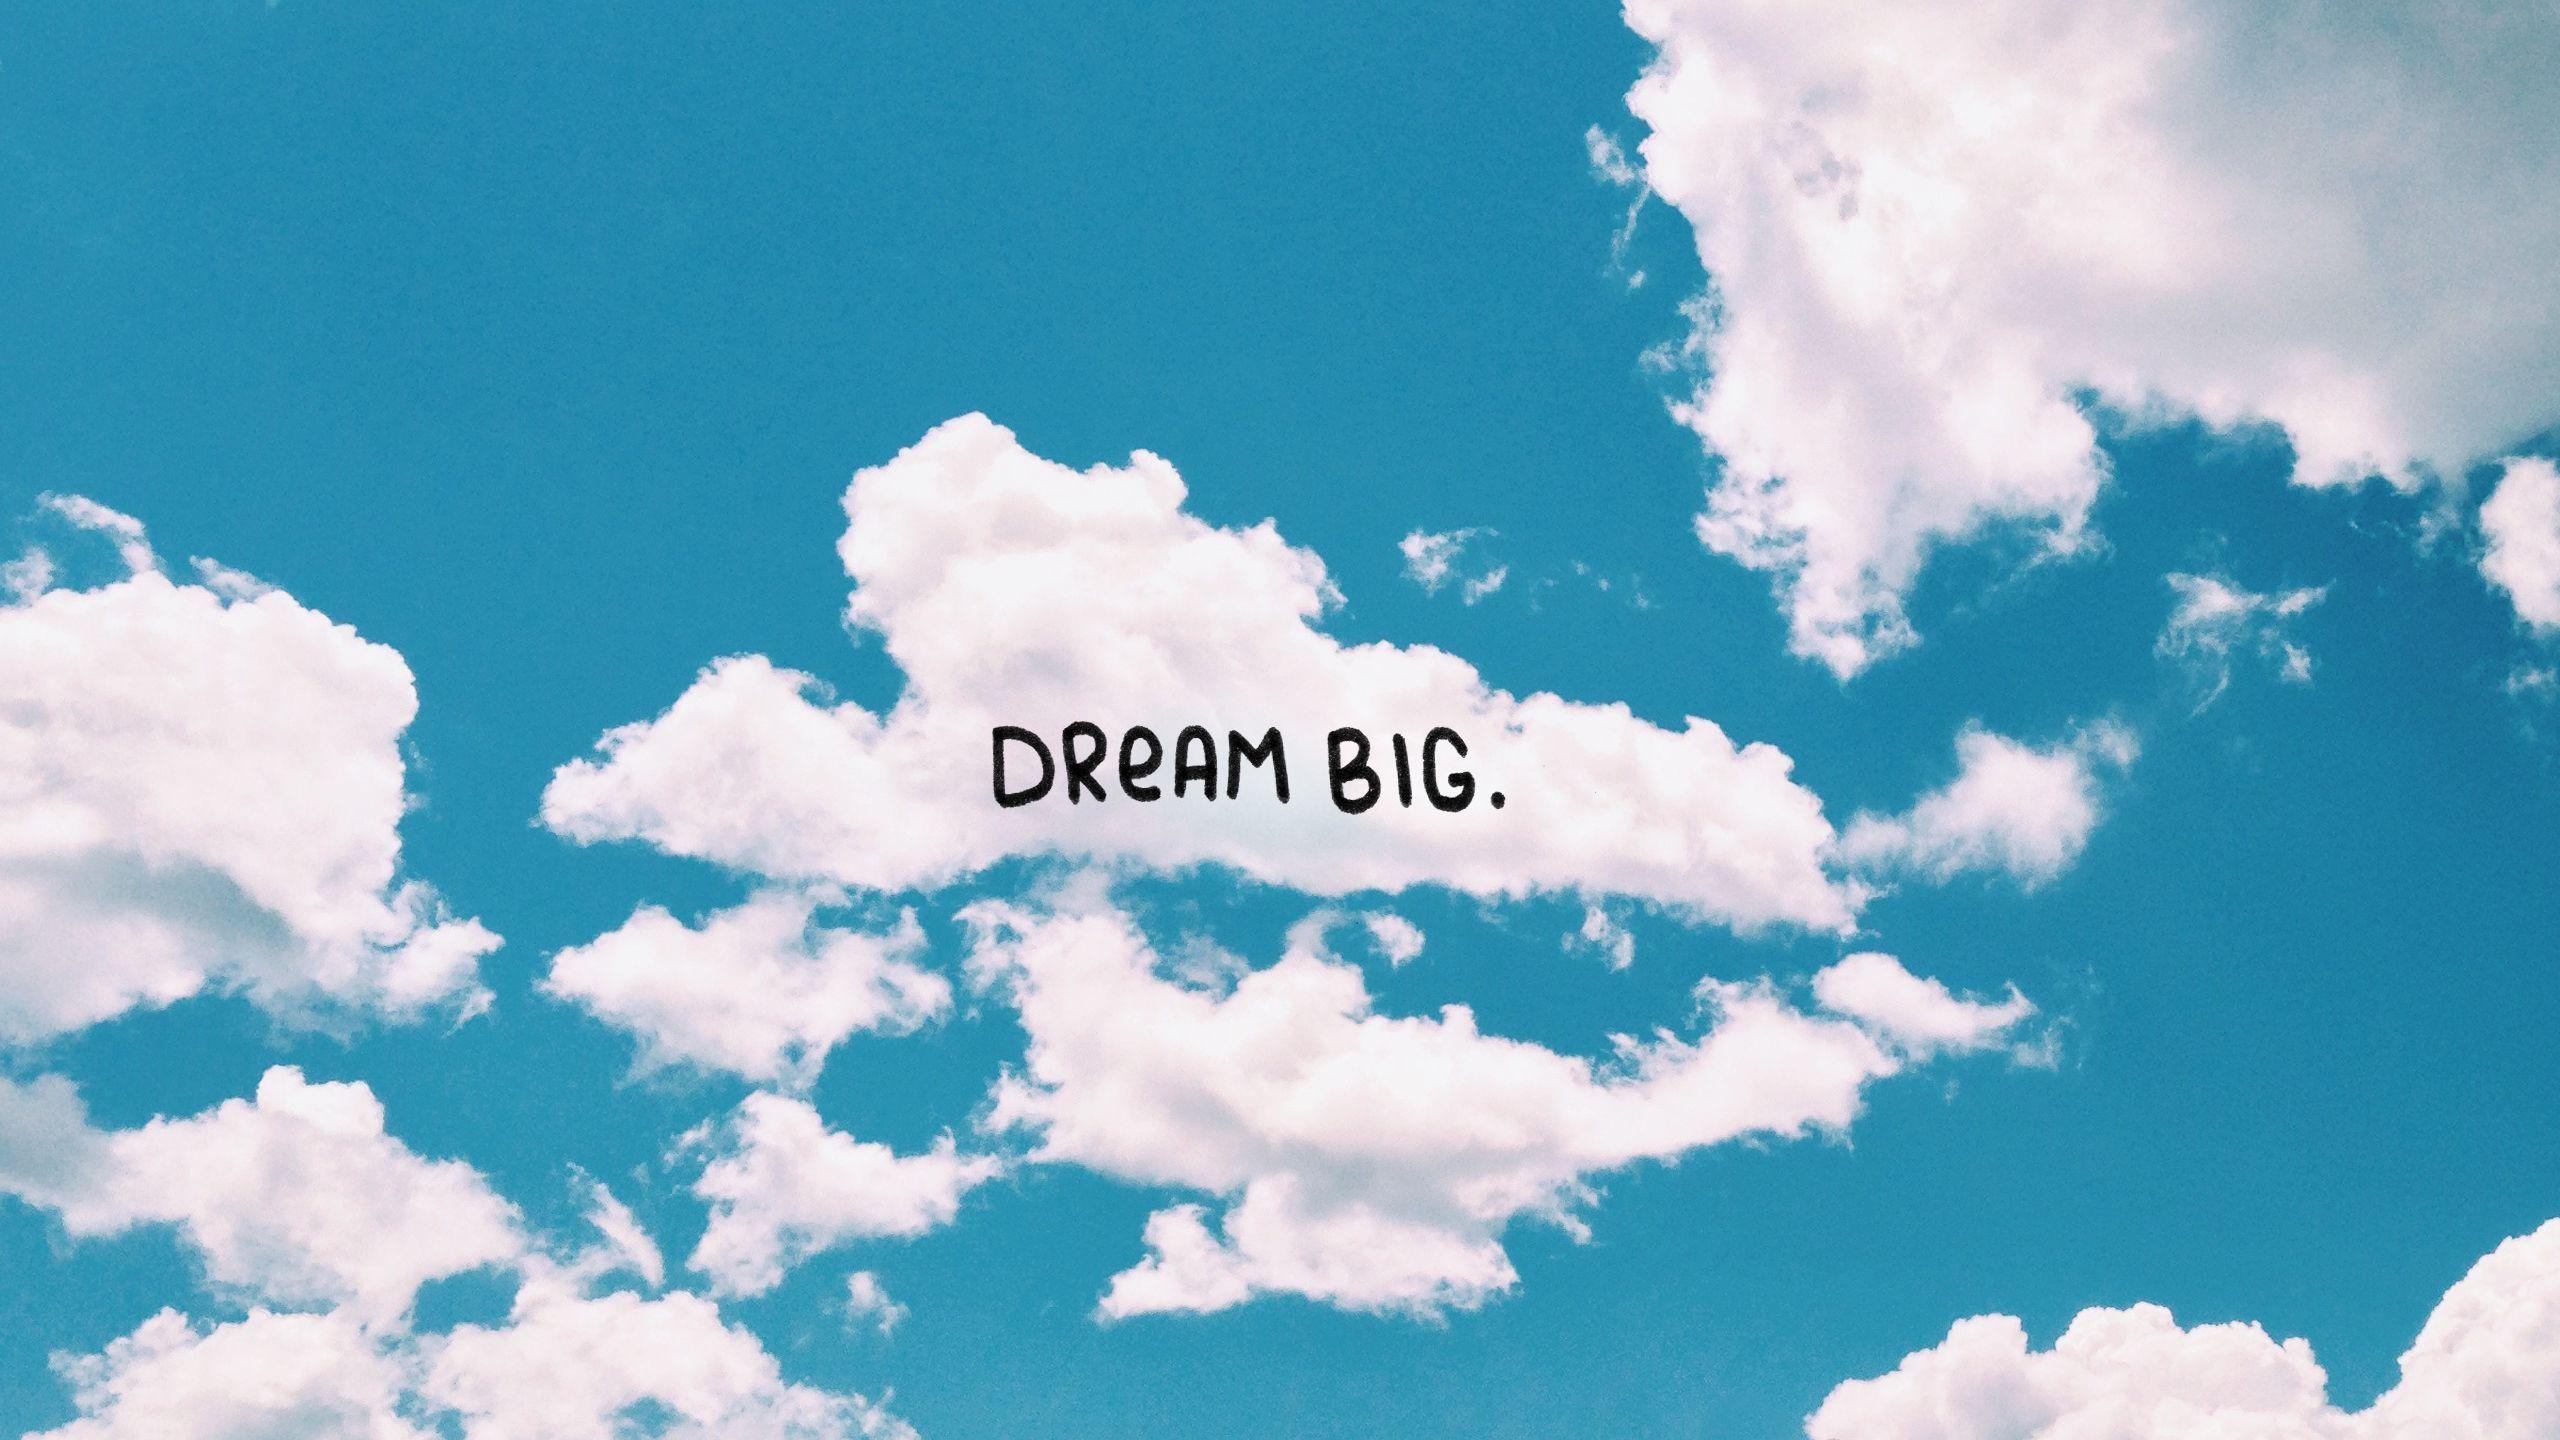 Pin By Julianny On Maria In 2020 Desktop Wallpaper Art Desktop Wallpapers Backgrounds Dream Big Cloud